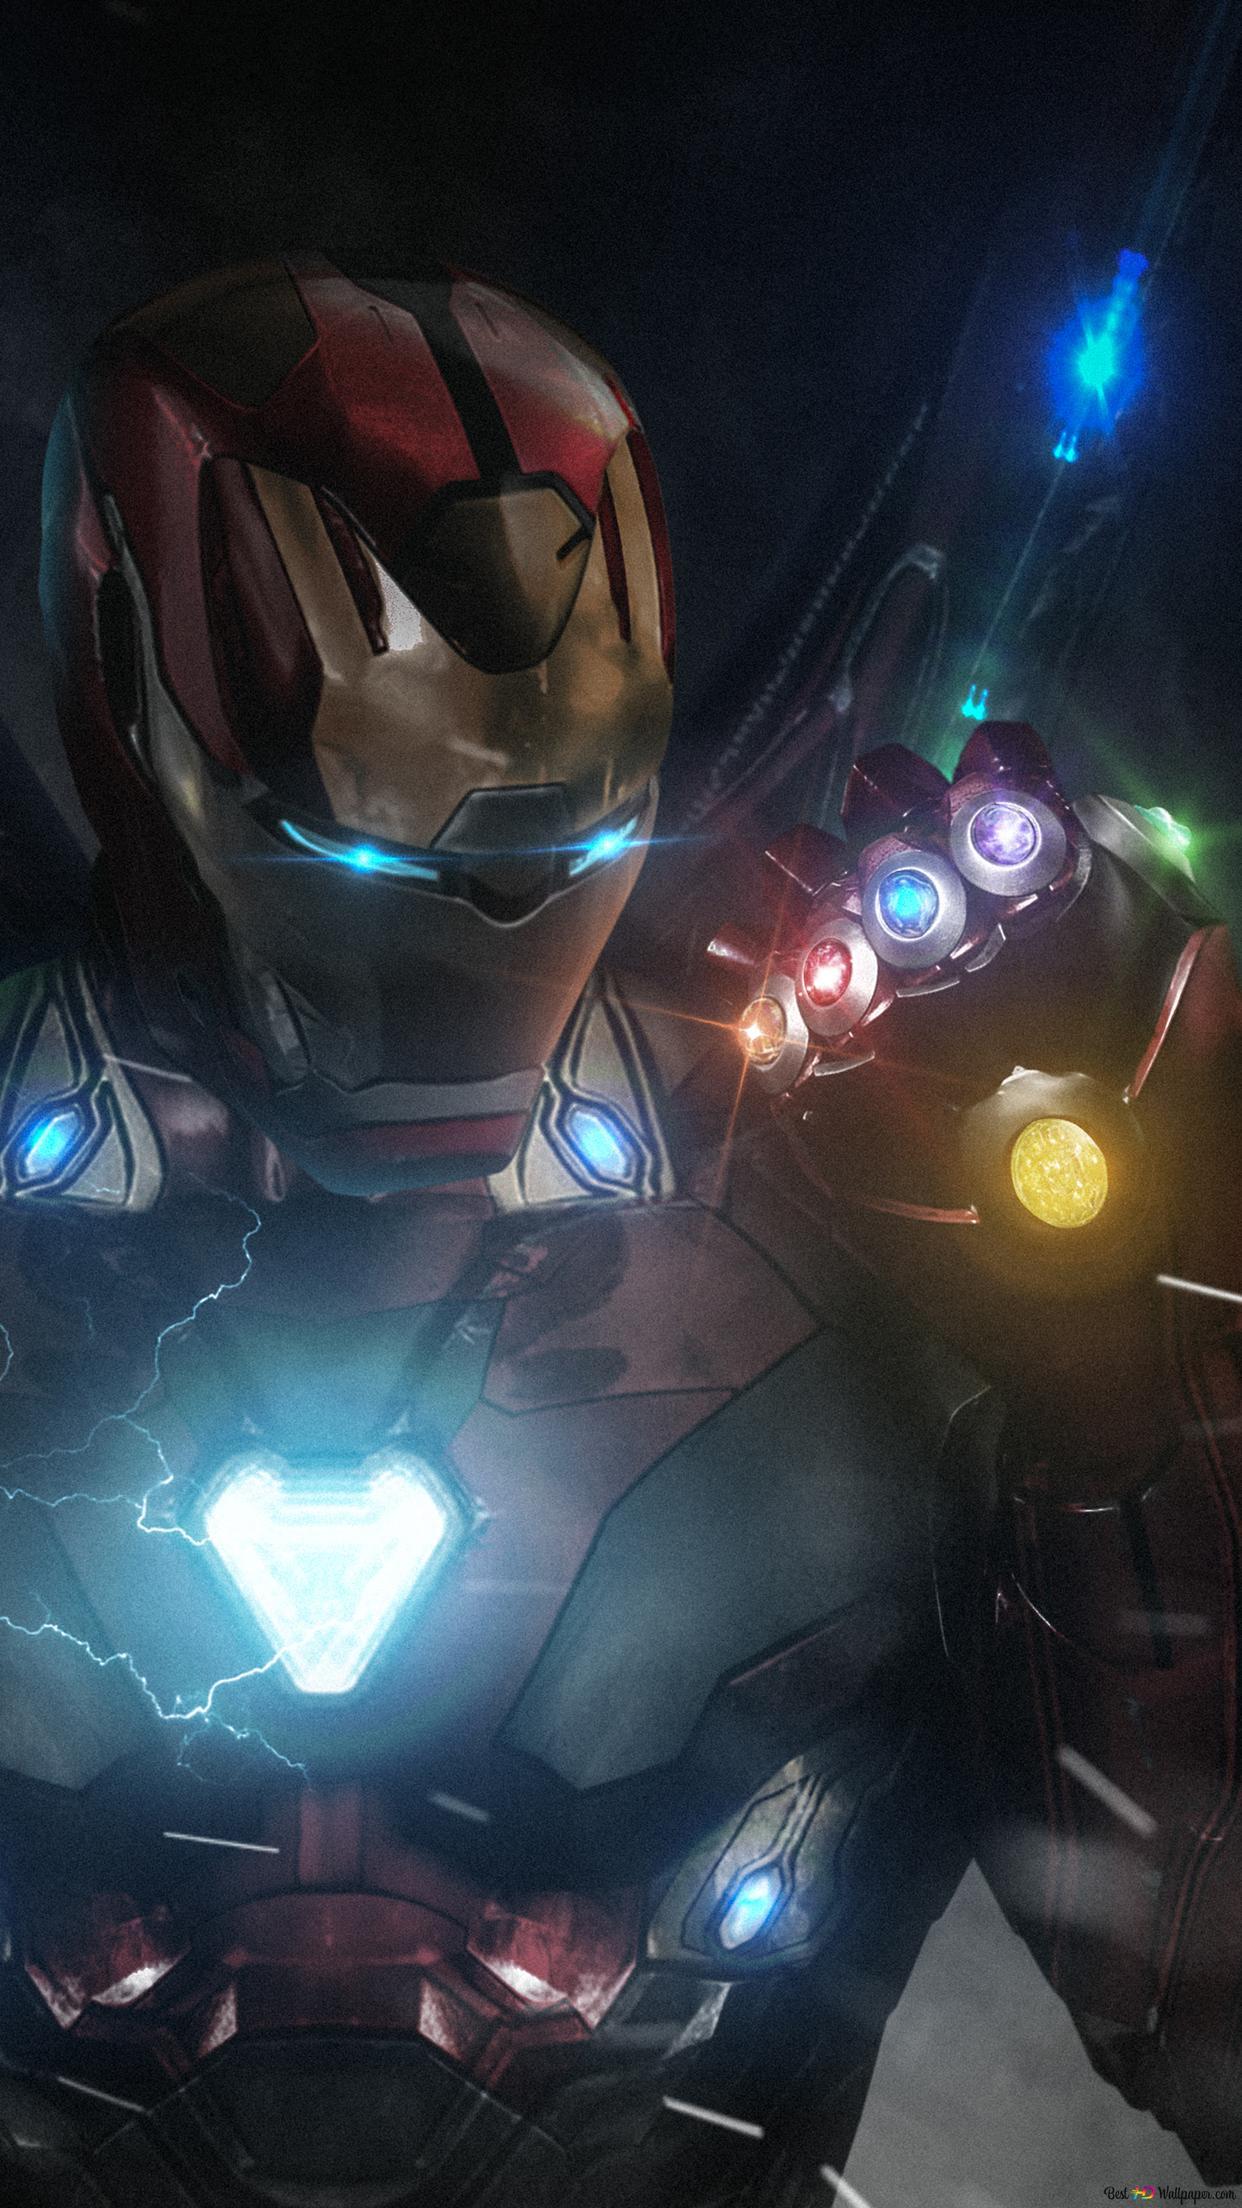 Avengers Endgame Ironman With Infinity Gauntlet Hd Wallpaper Download